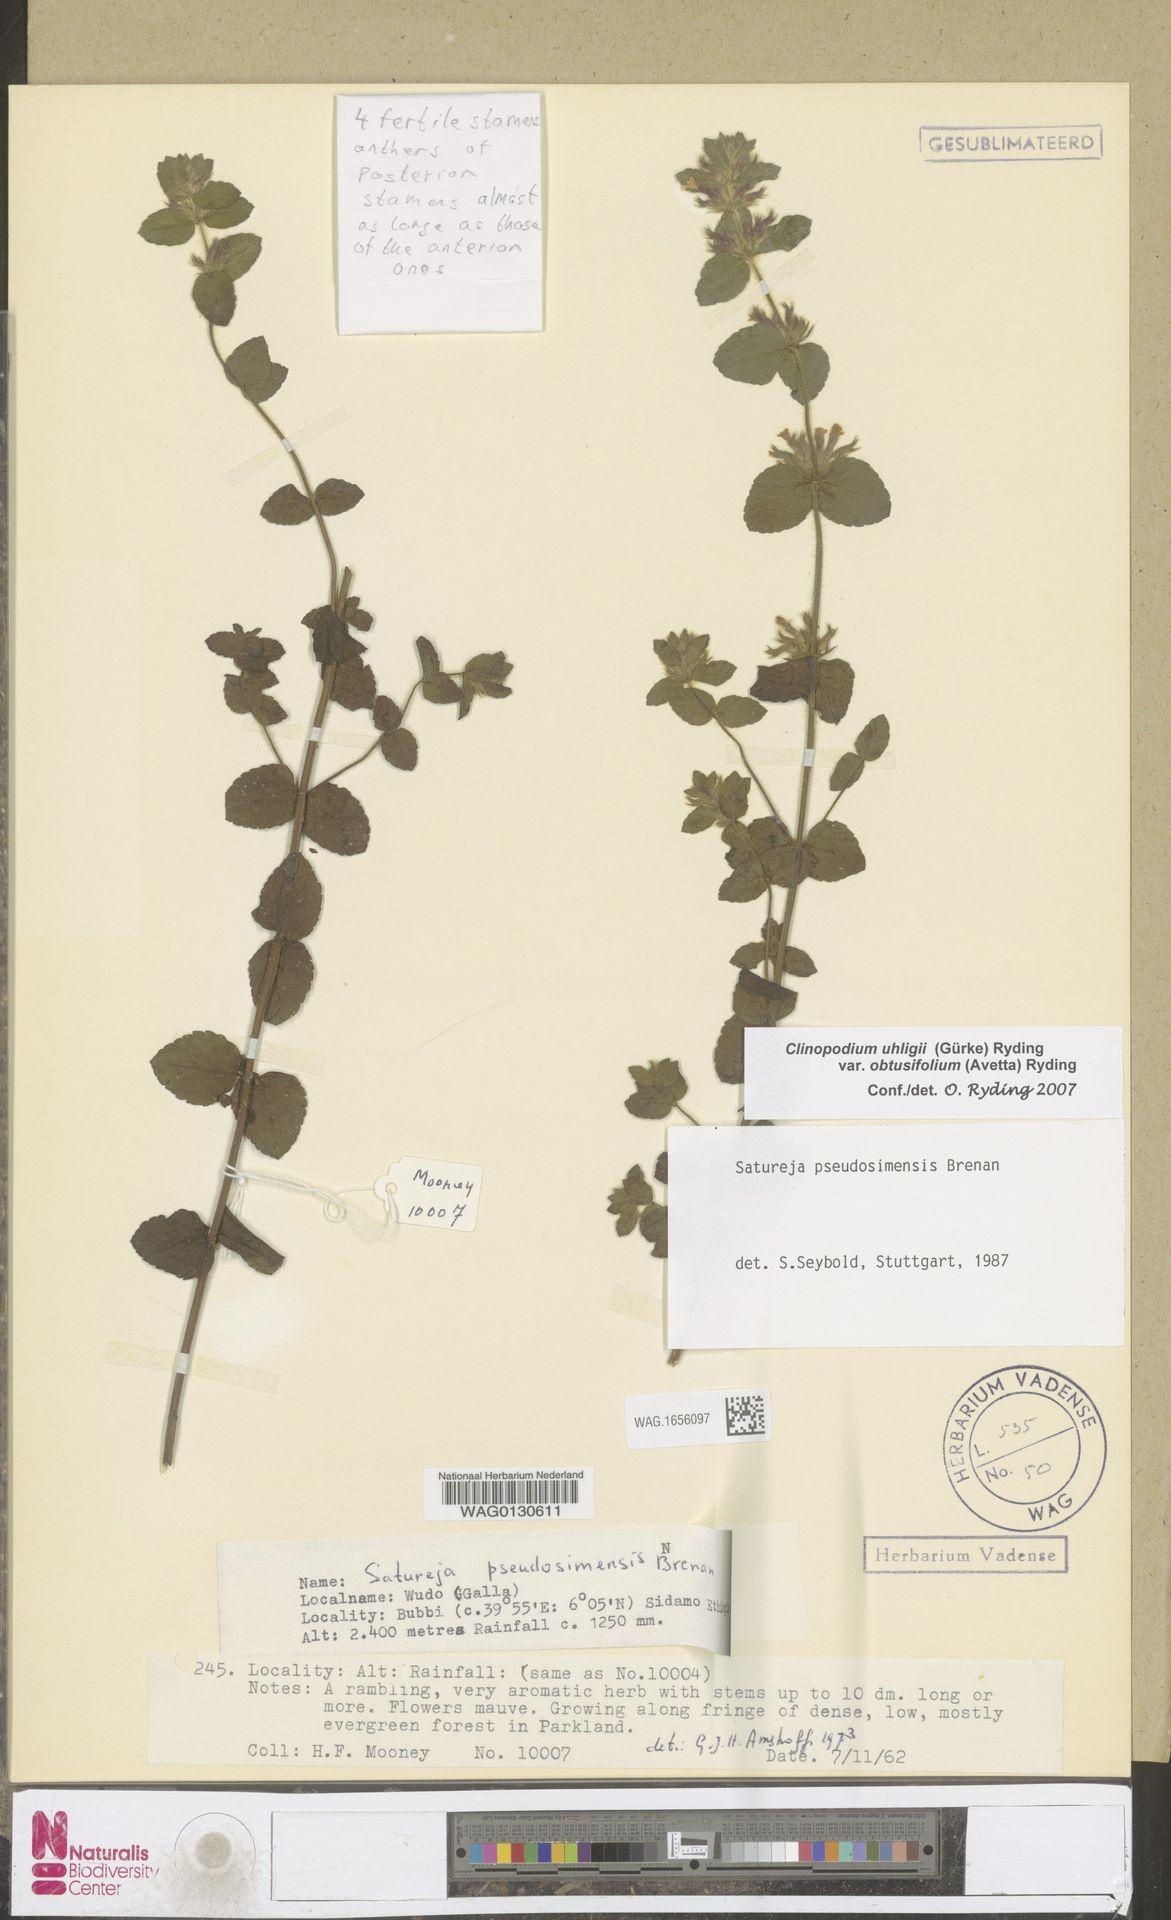 WAG.1656097 | Clinopodium uhligii var. obtusifolium (Avetta) Ryding